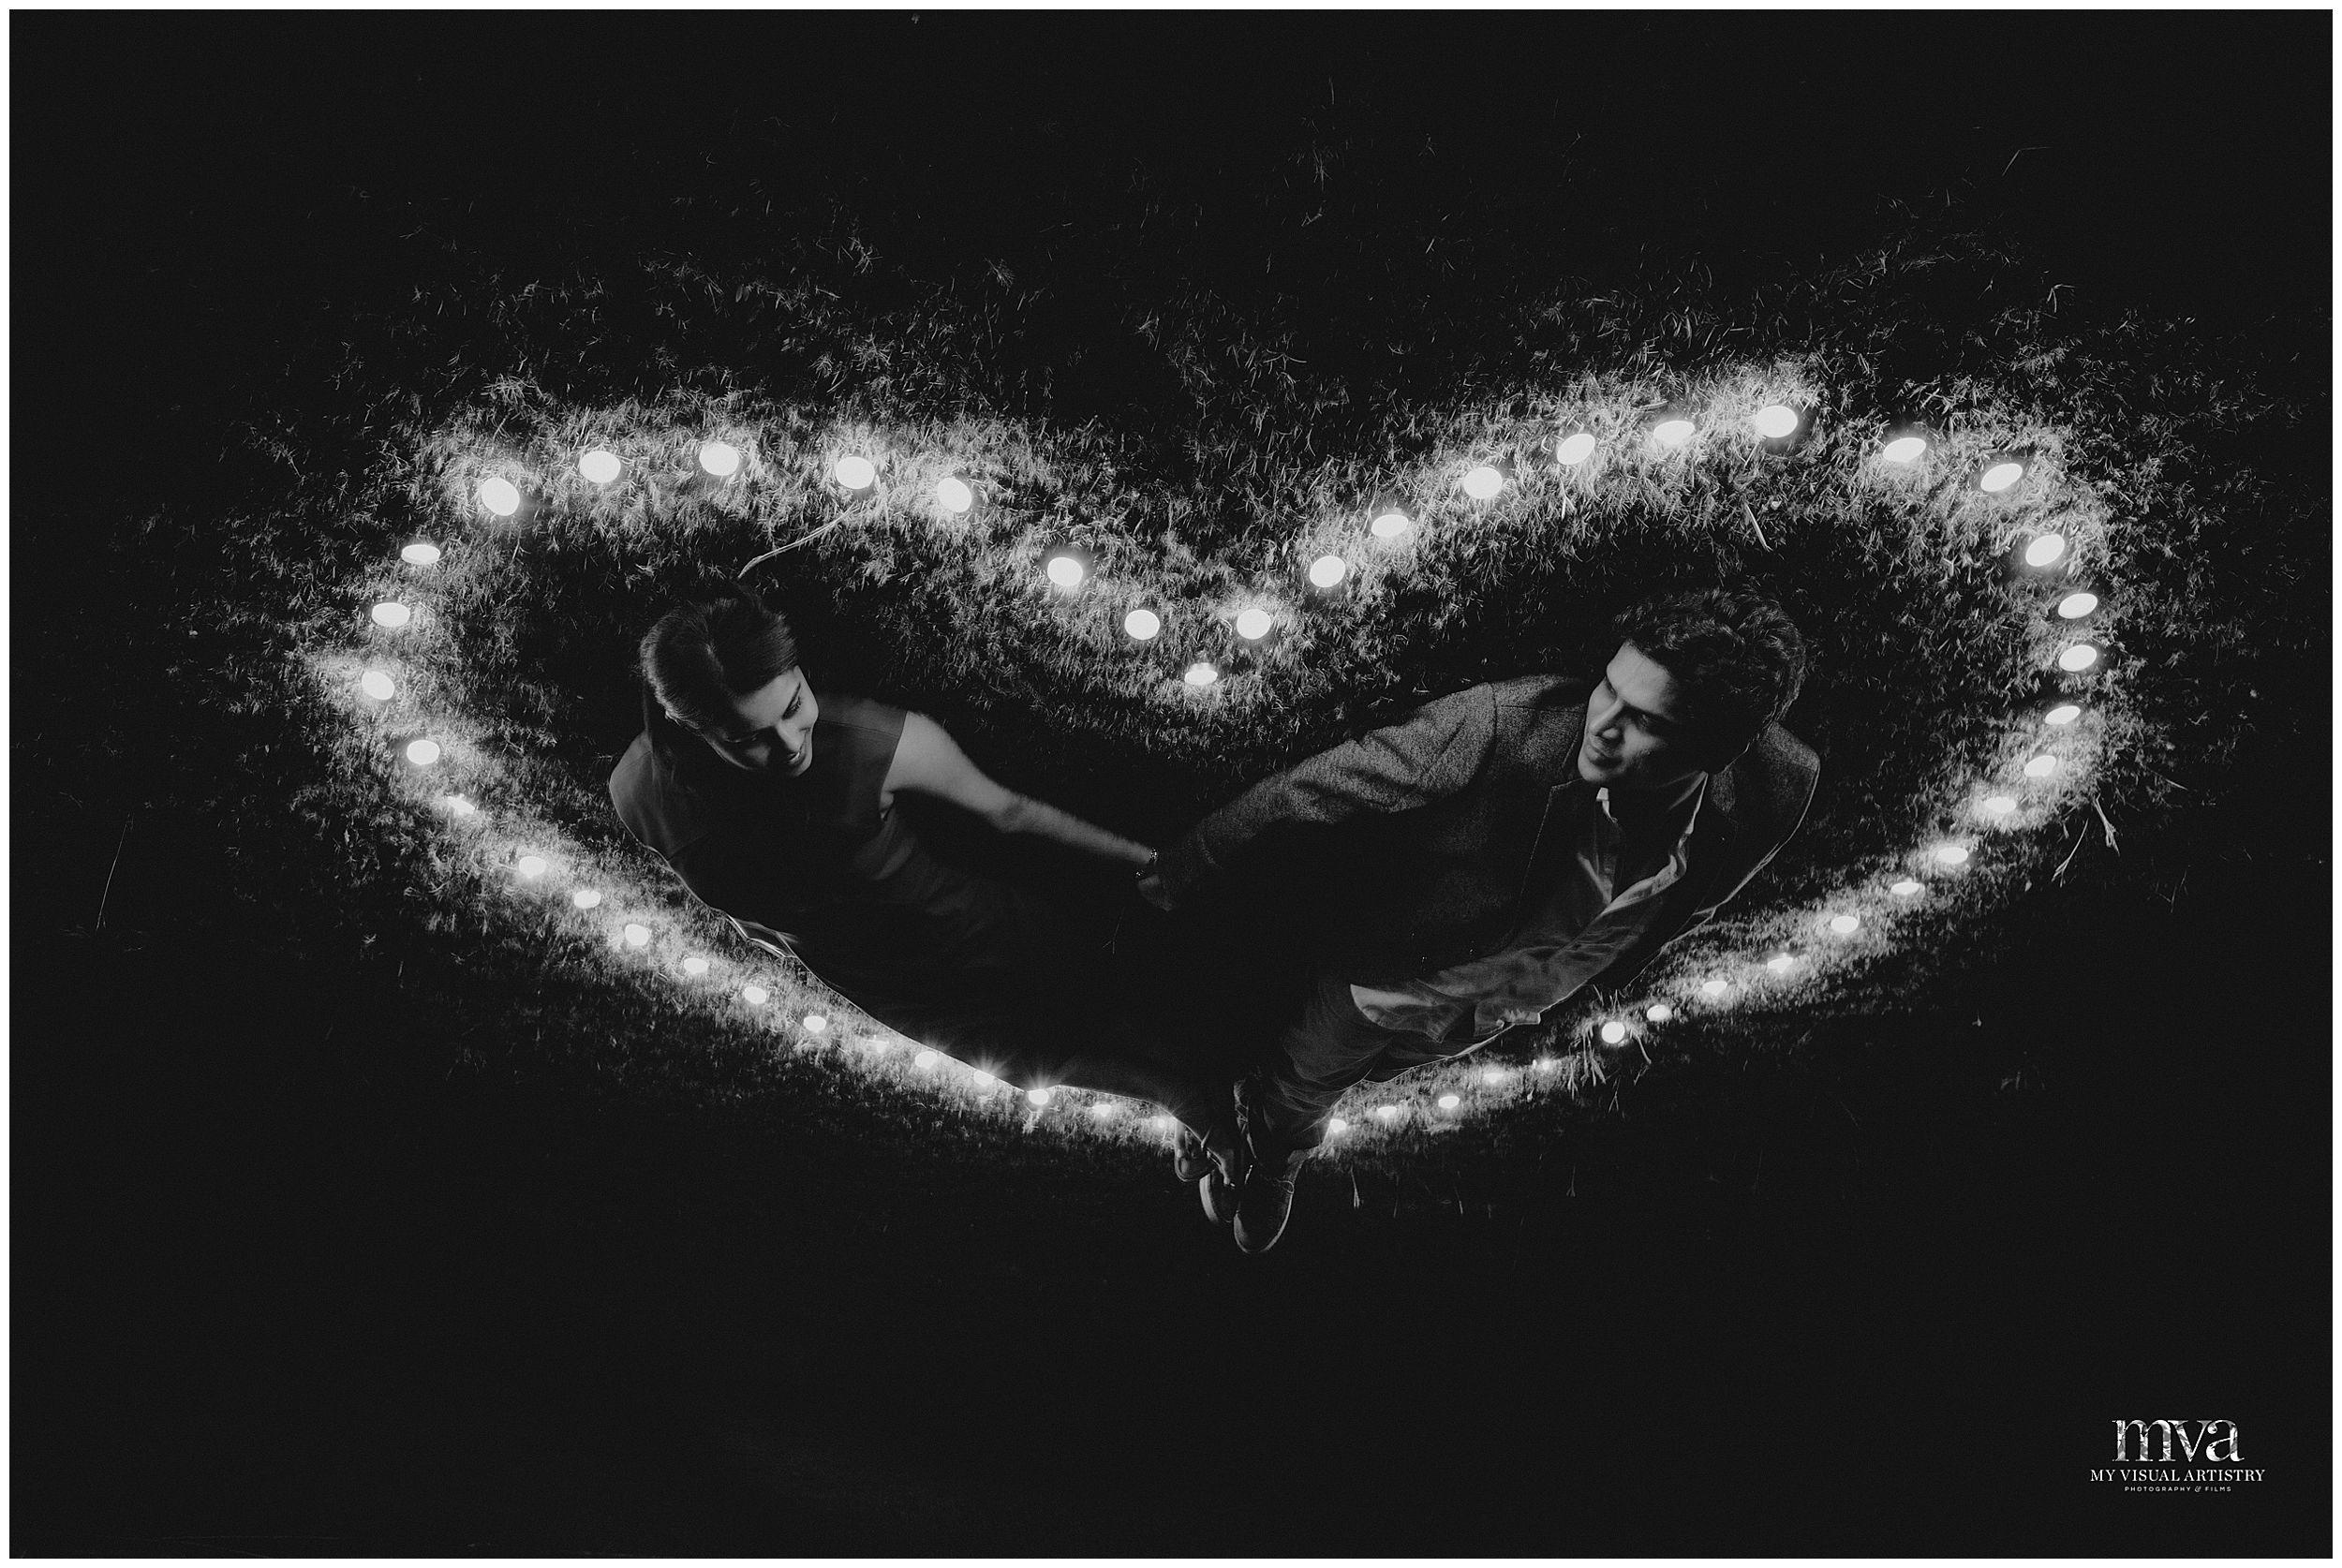 SAHIL_MANALI_MYVISUALARTISTRY__WEDDING_PHOTOGRAPHER_JANNATVALLEY_COUPLESHOOT_DESTINATION_FARIDABAD_PREWEDDING30.jpg